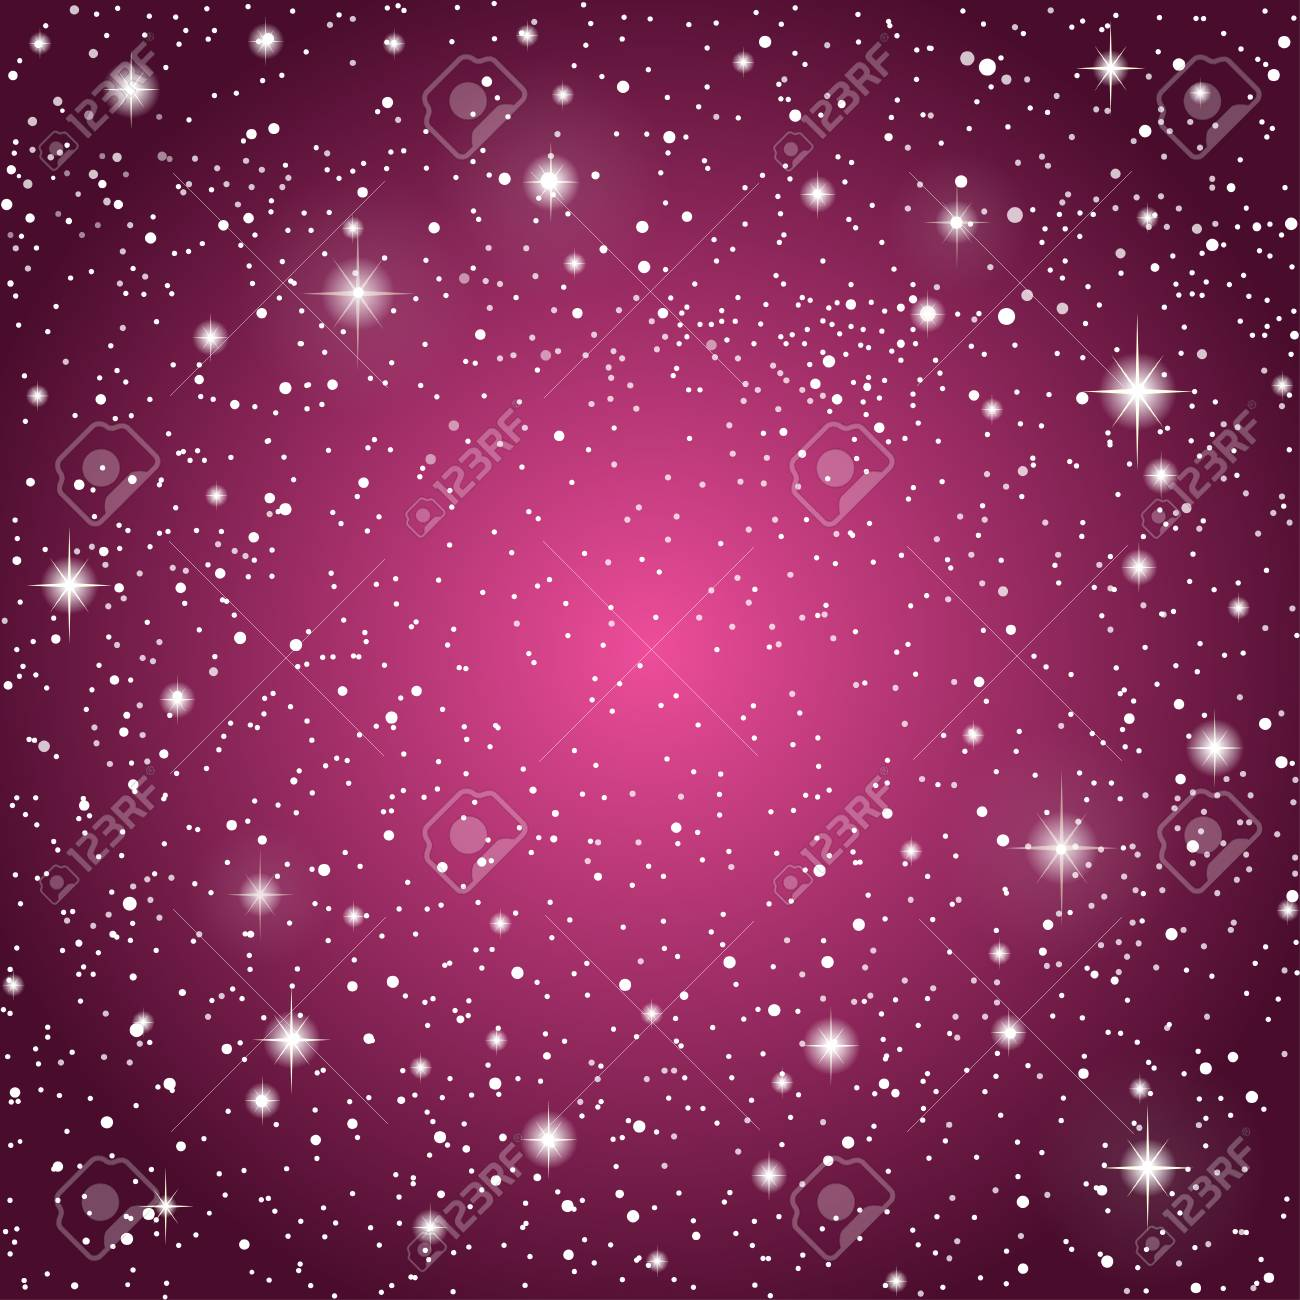 Realistic Starry Sky with Purple Glow. Shining Stars Dark Sky. Background, Wallpaper.